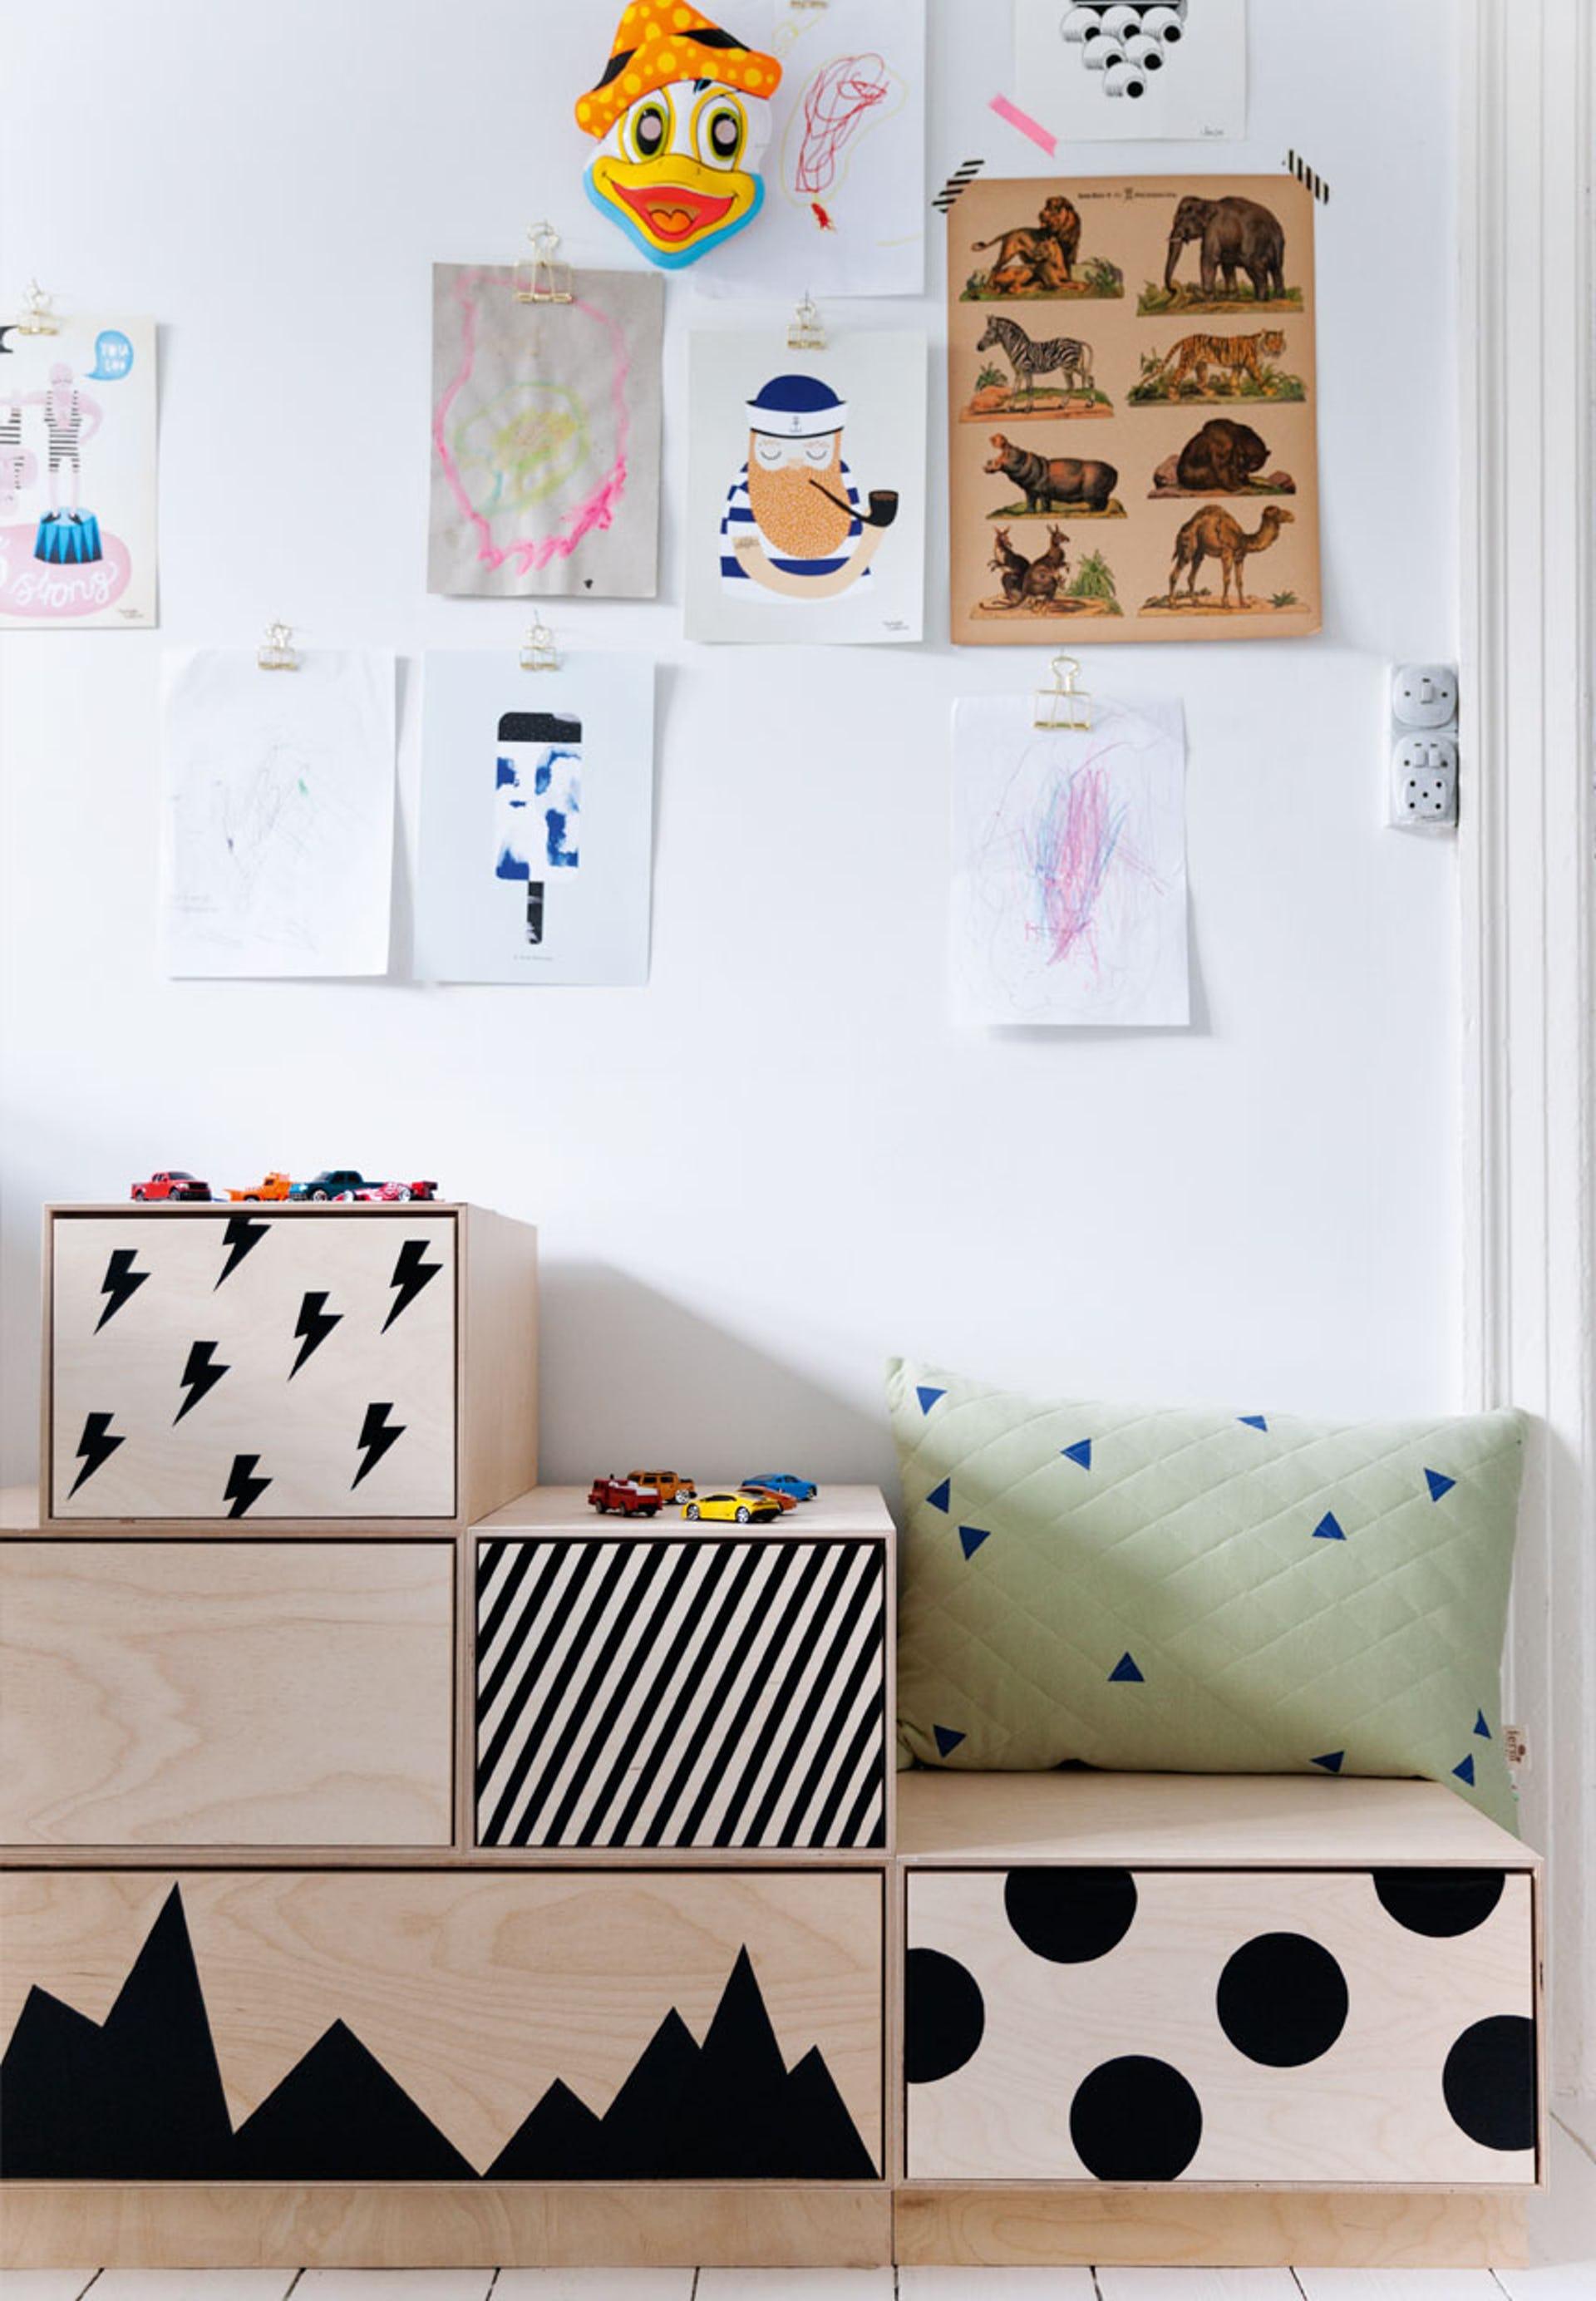 Cool Kids Storage Ideas I Want That